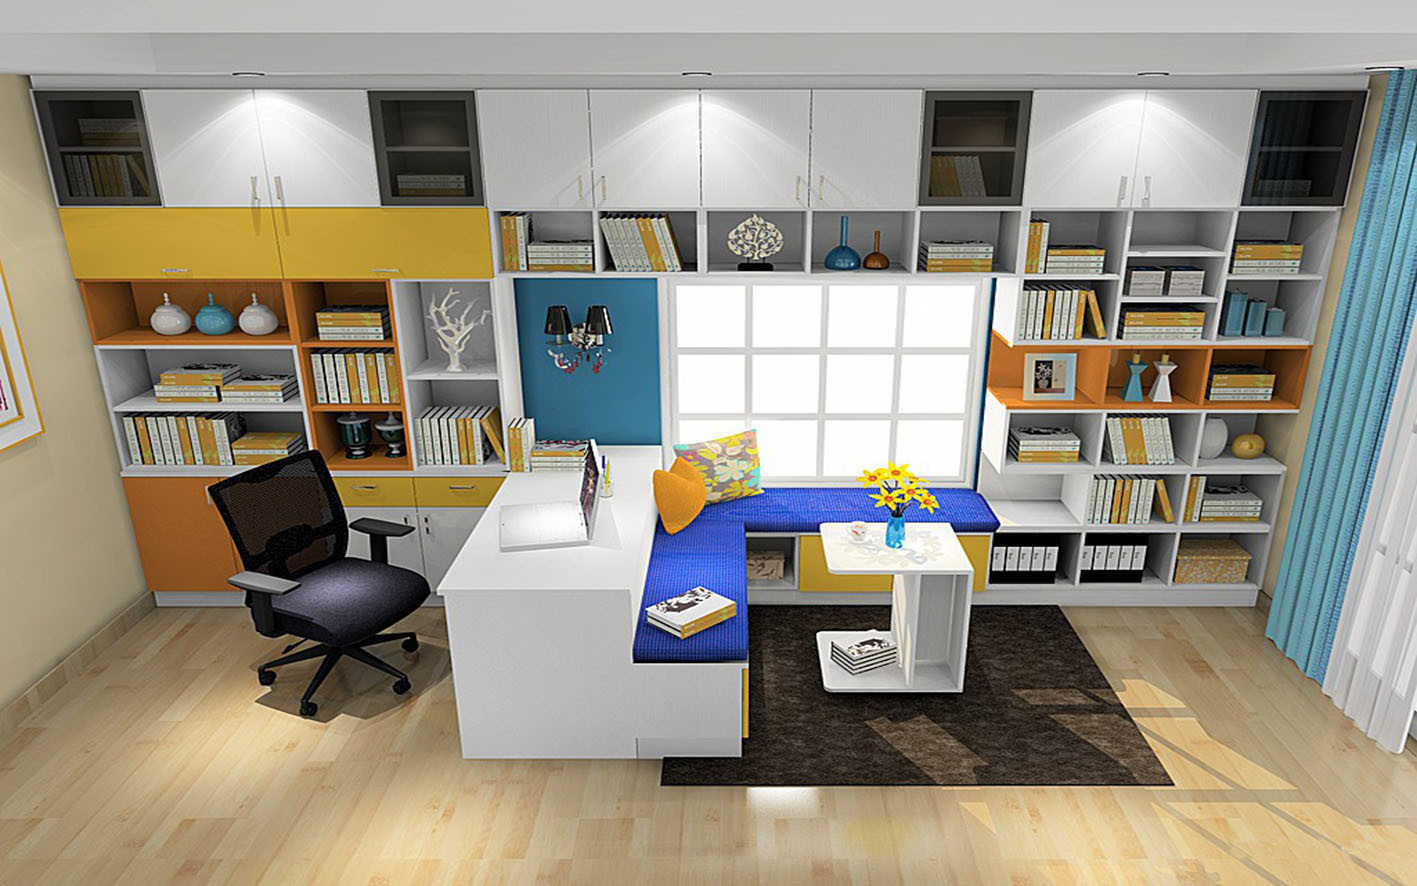 Pritical White Color Book Case Study Room Furniture (zj-005)